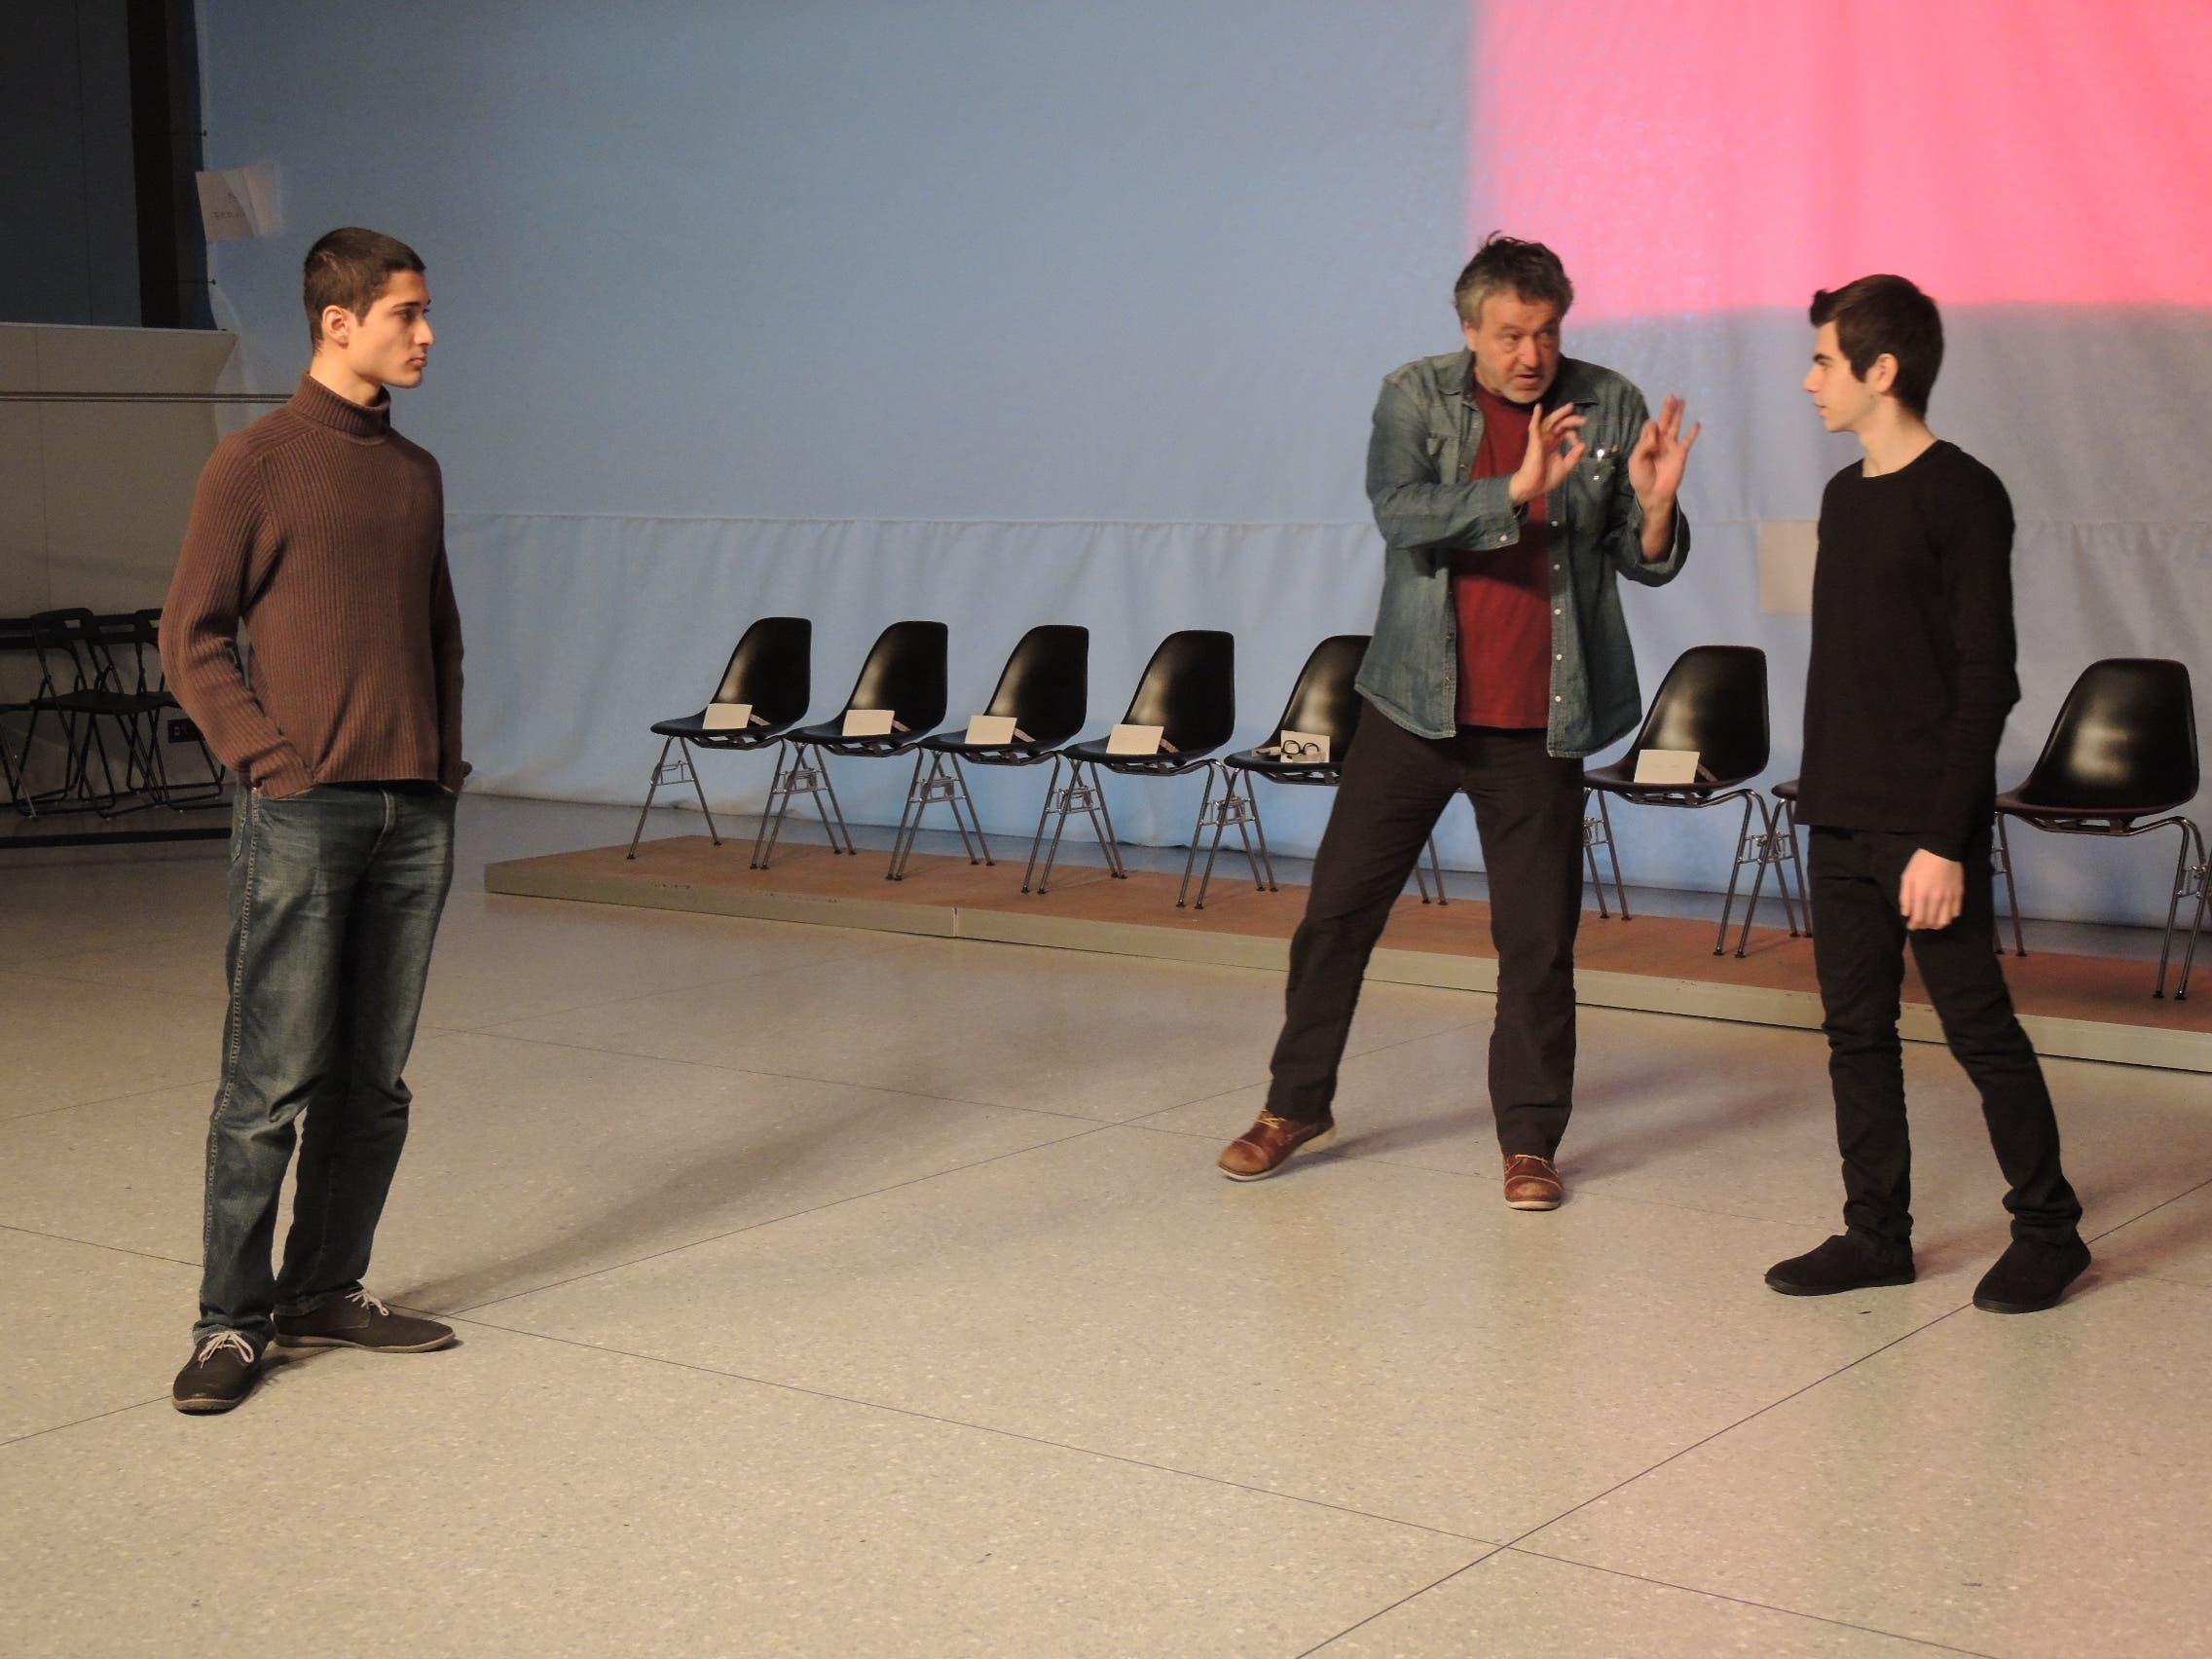 Ueli Haenni (Mitte) gibt den Schülern Tolga Sevim (links) und Elvio Petillo Tipps